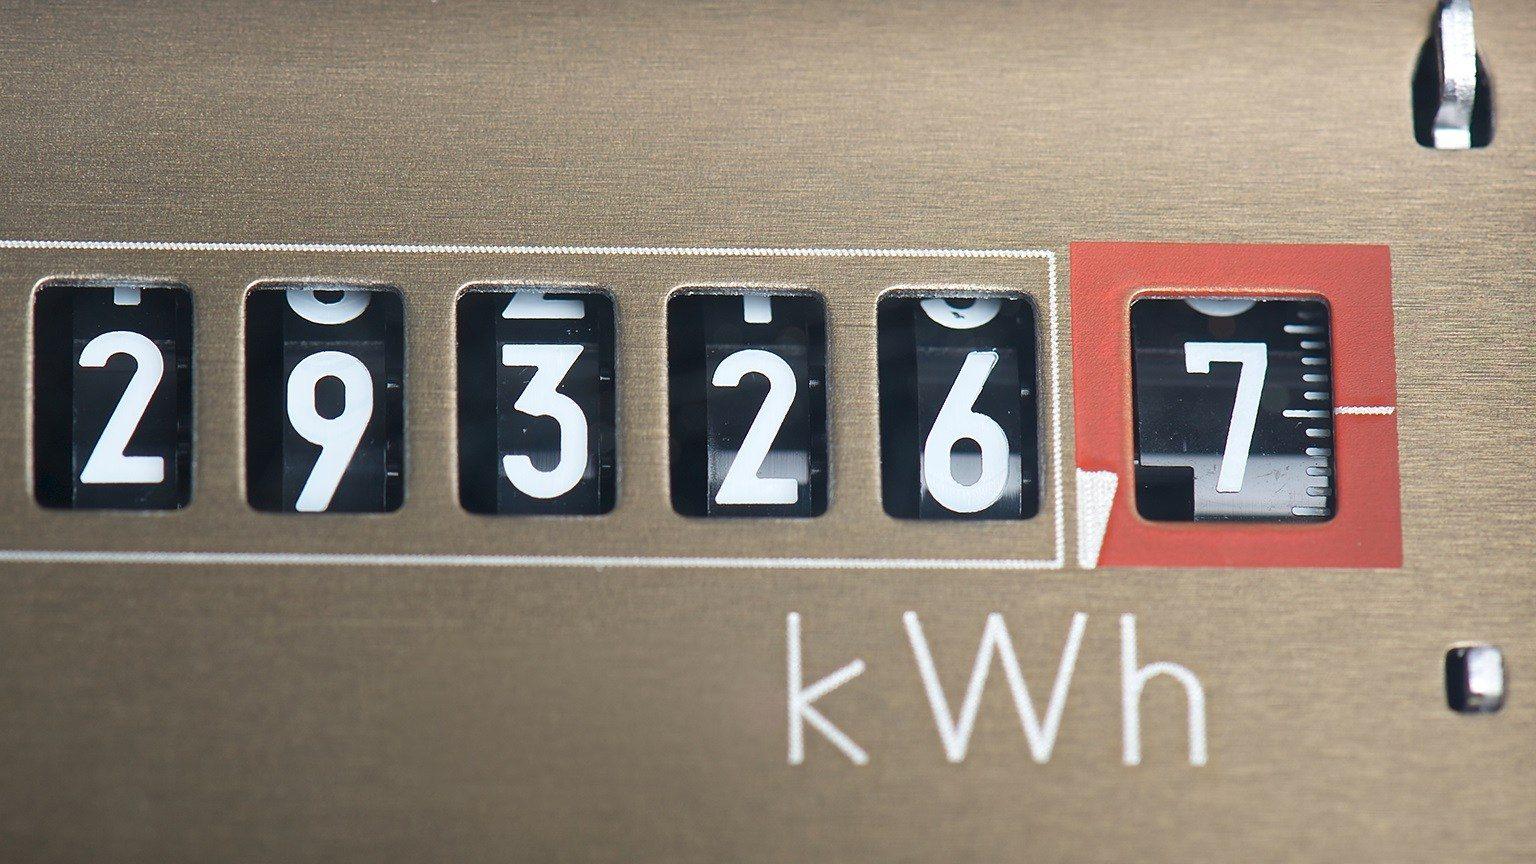 Electricity meter - kilowatt